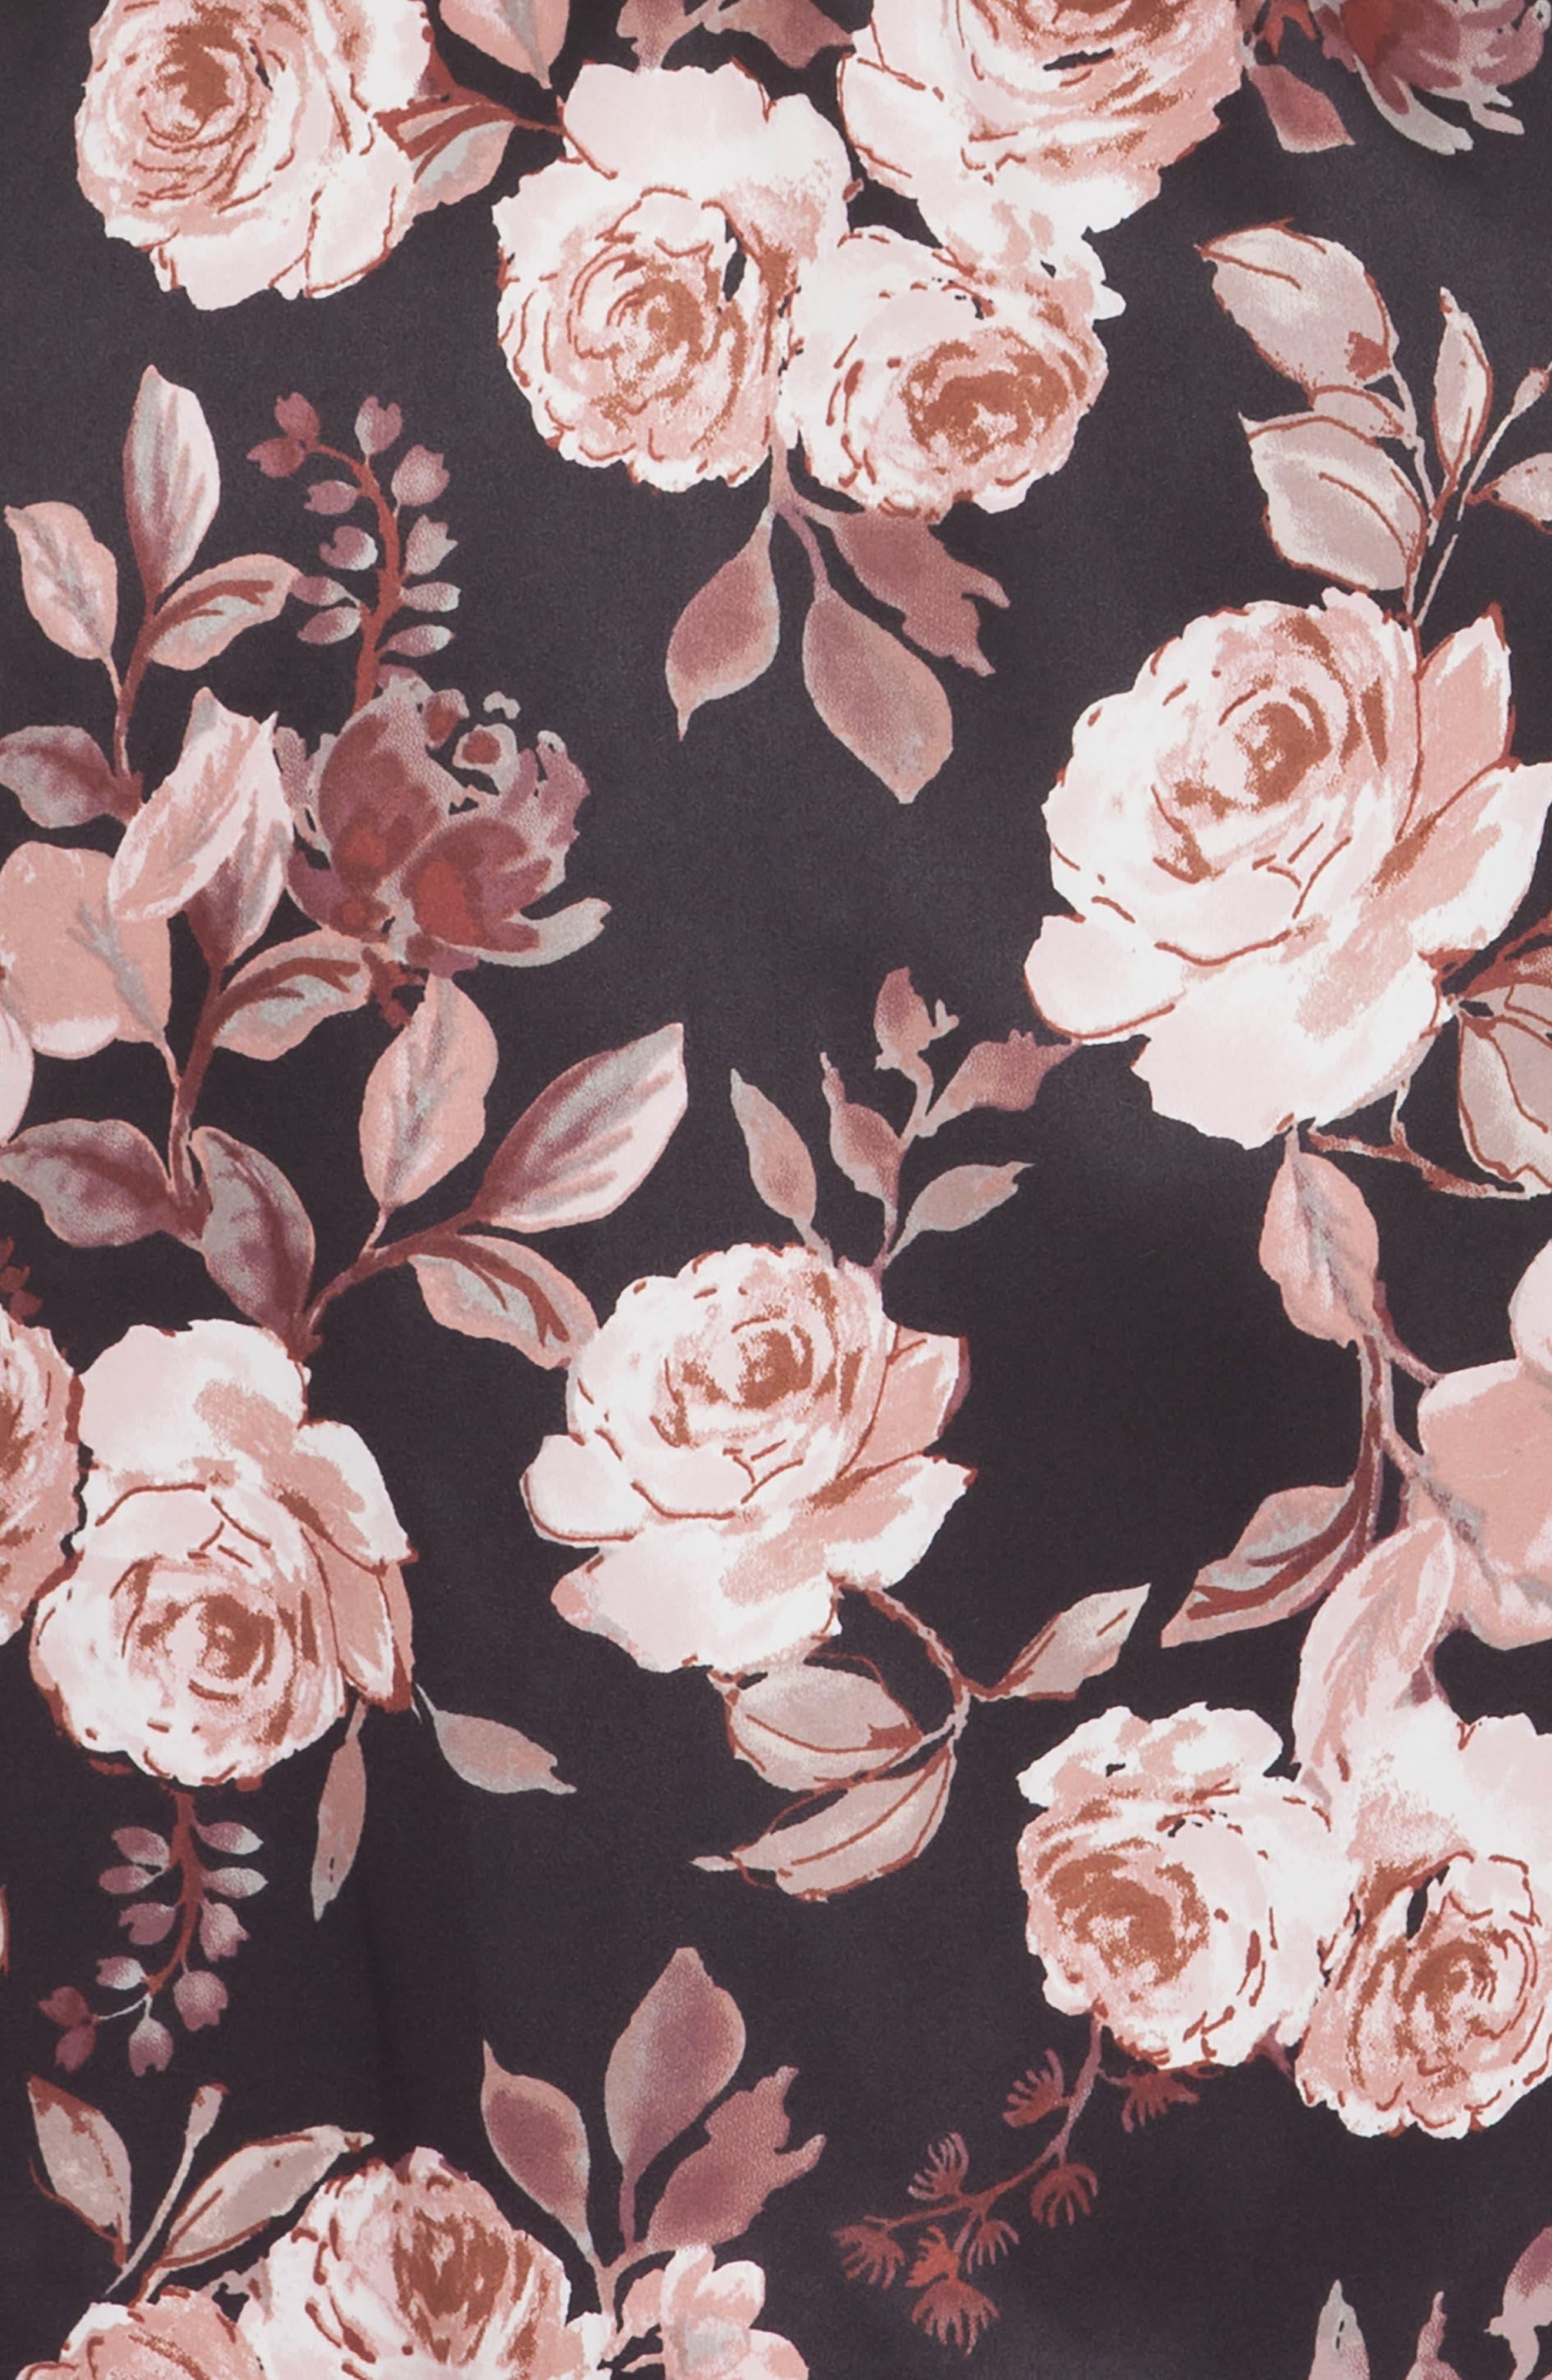 Floral Print Kimono Robe,                             Alternate thumbnail 4, color,                             001